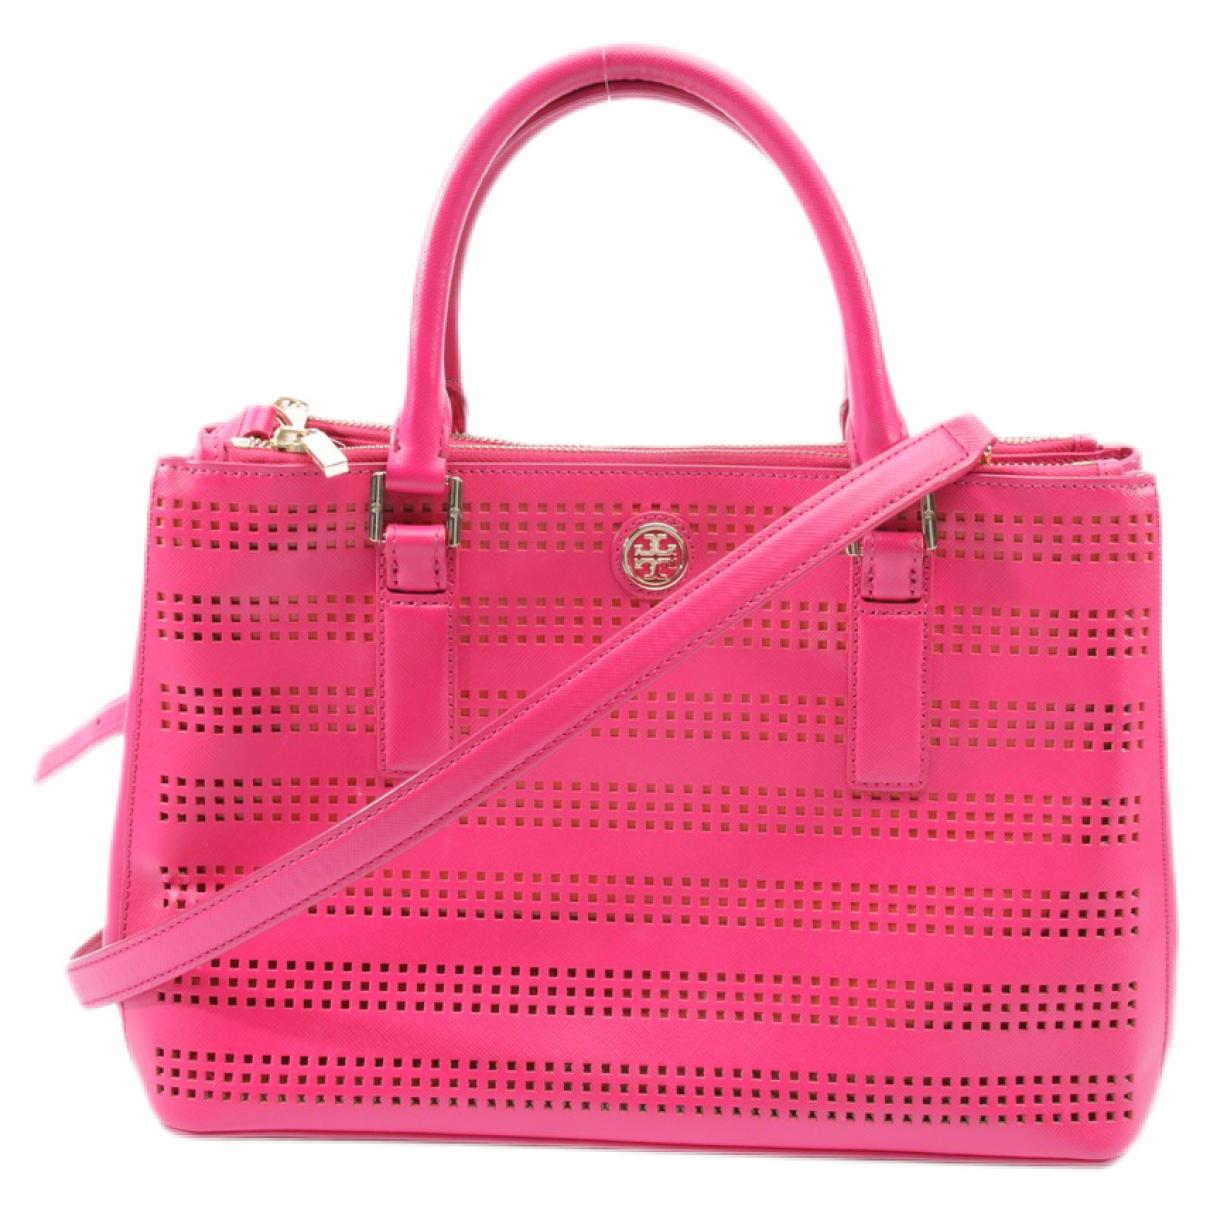 Tory Burch \N Handtasche in  Rot Leder